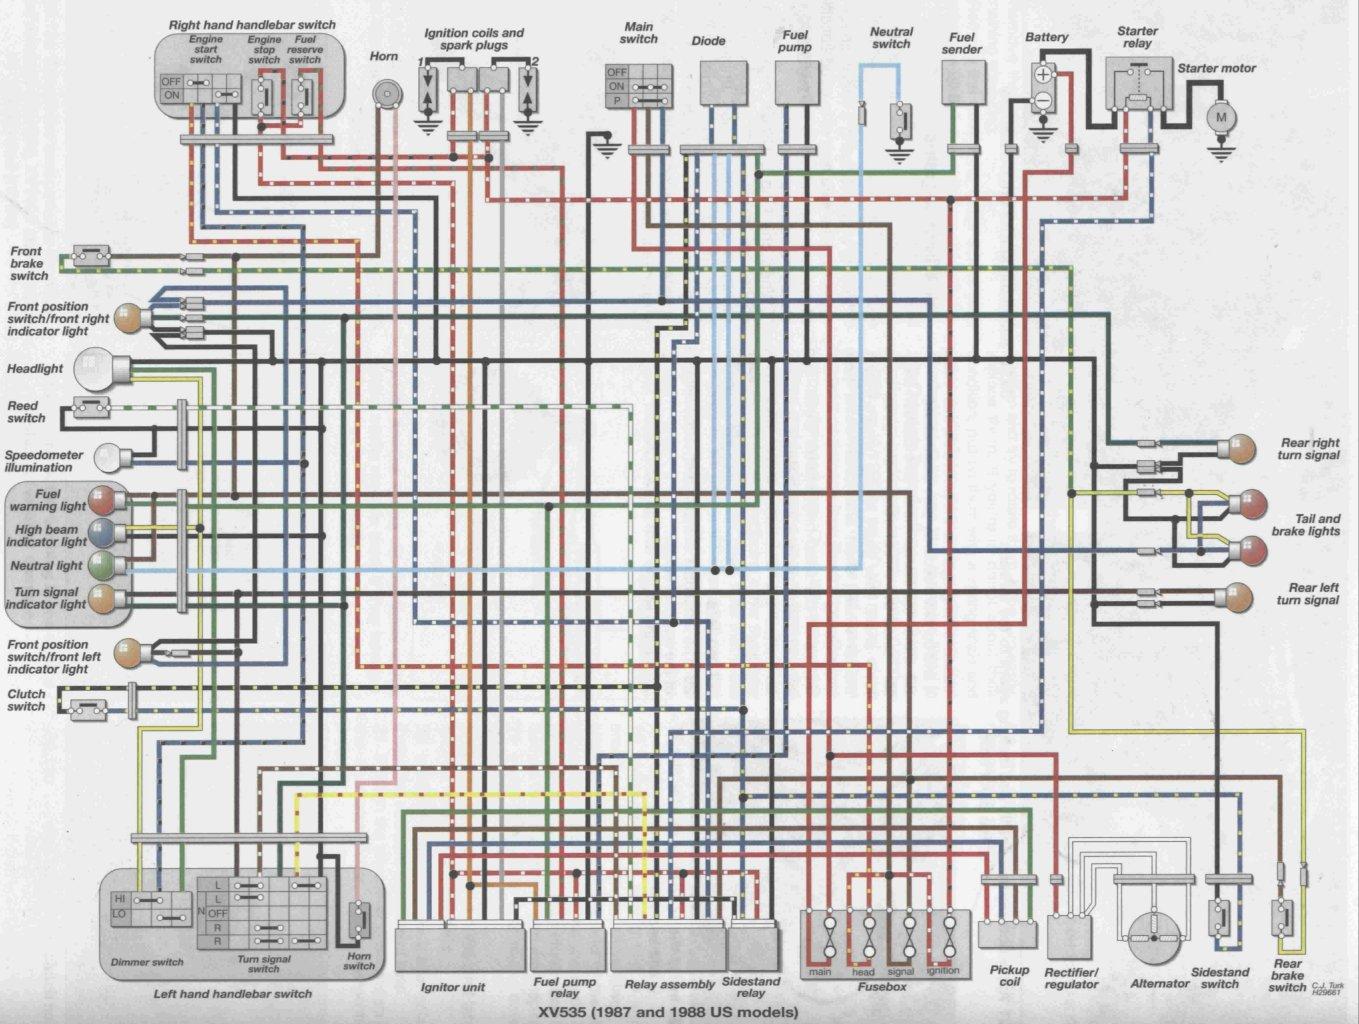 1982 yamaha virago wiring diagram 1982 image 1982 yamaha virago wiring diagram 1982 image wiring diagram